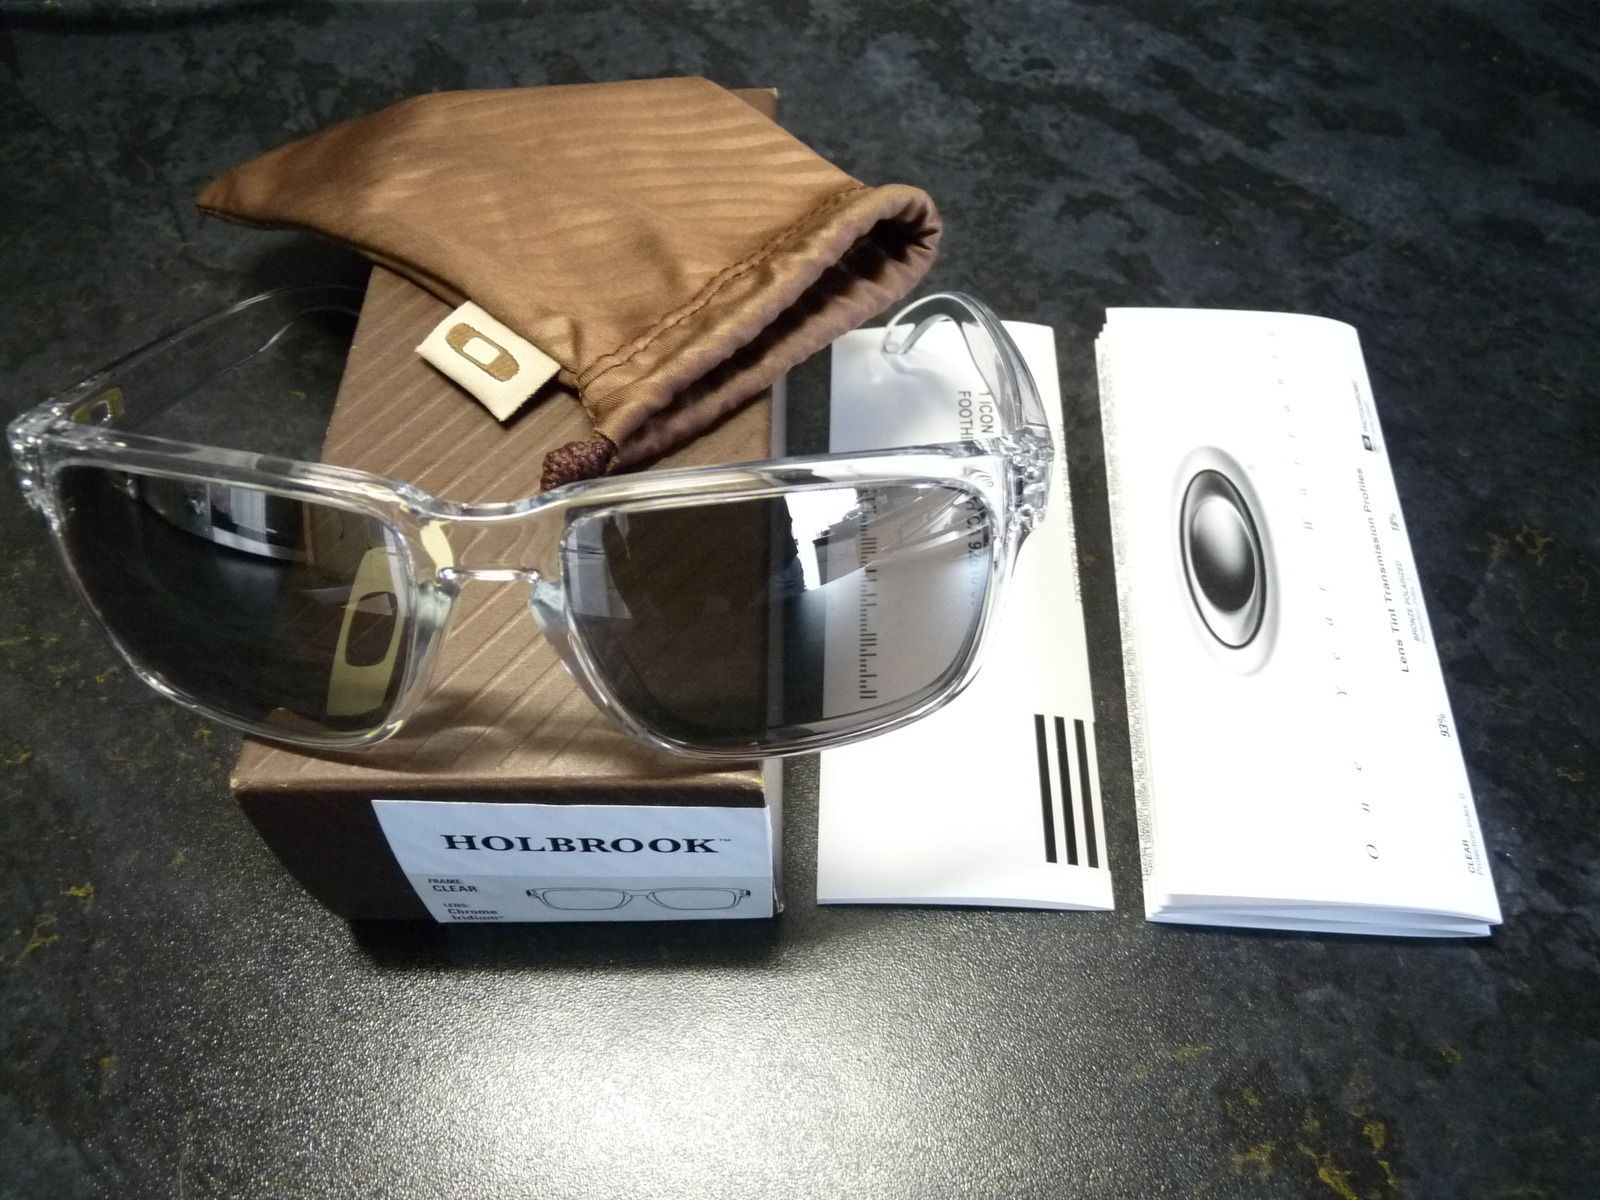 HOLBROOK (Clear W/ Chrome Iridium) And SPIKE (Titanium W/ Titanium Iridium) - p1080780lv.jpg